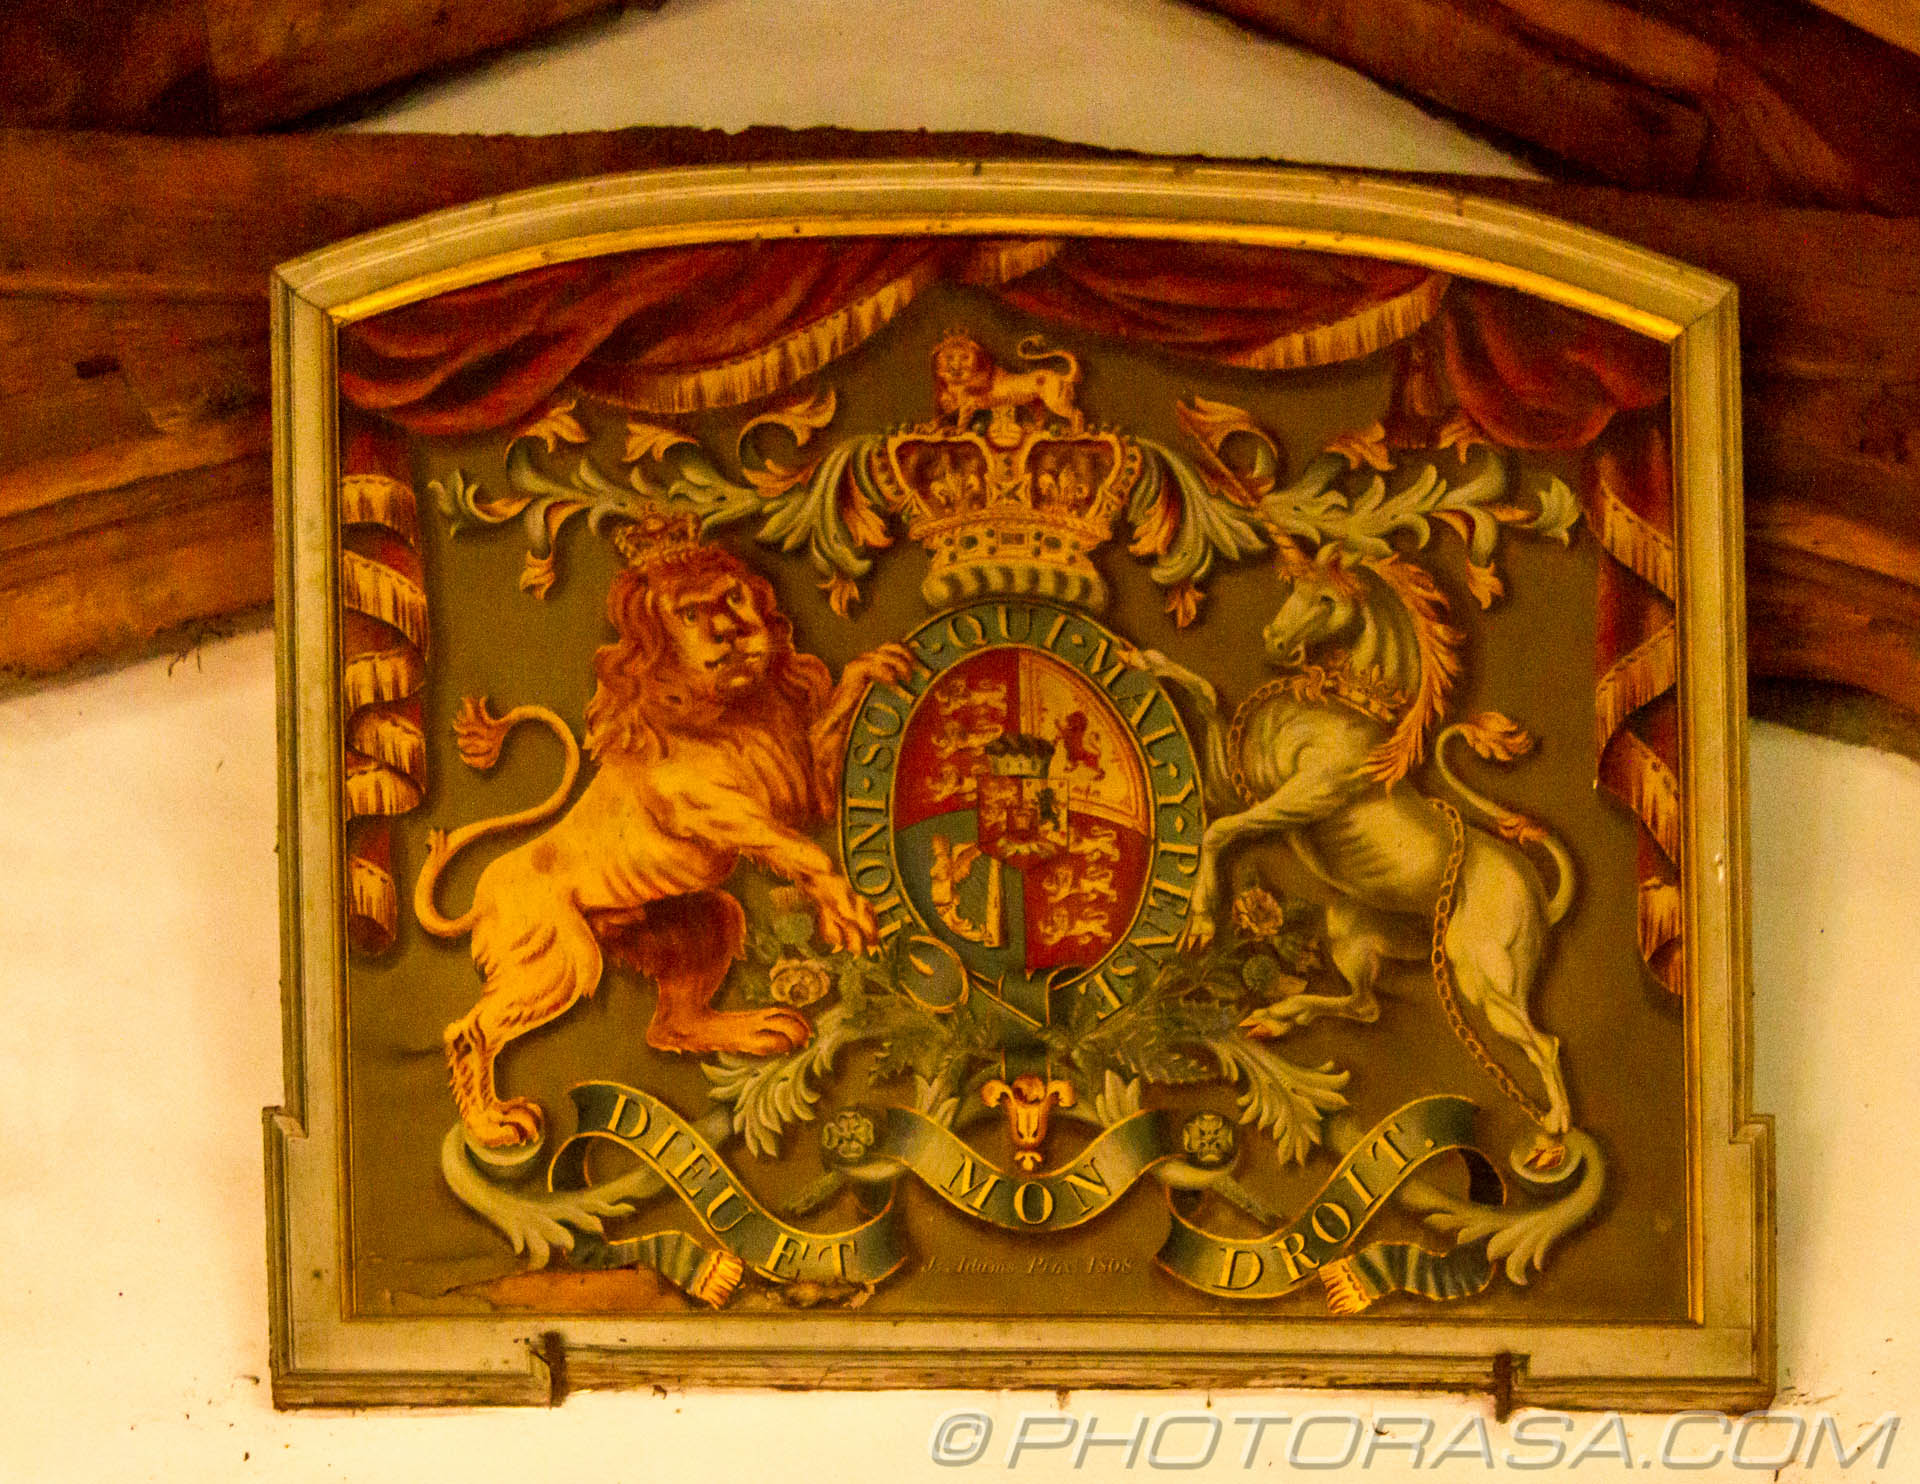 http://photorasa.com/parish-church-st-peter-st-paul-headcorn/royal-coat-of-arms-of-king-george-the-third/